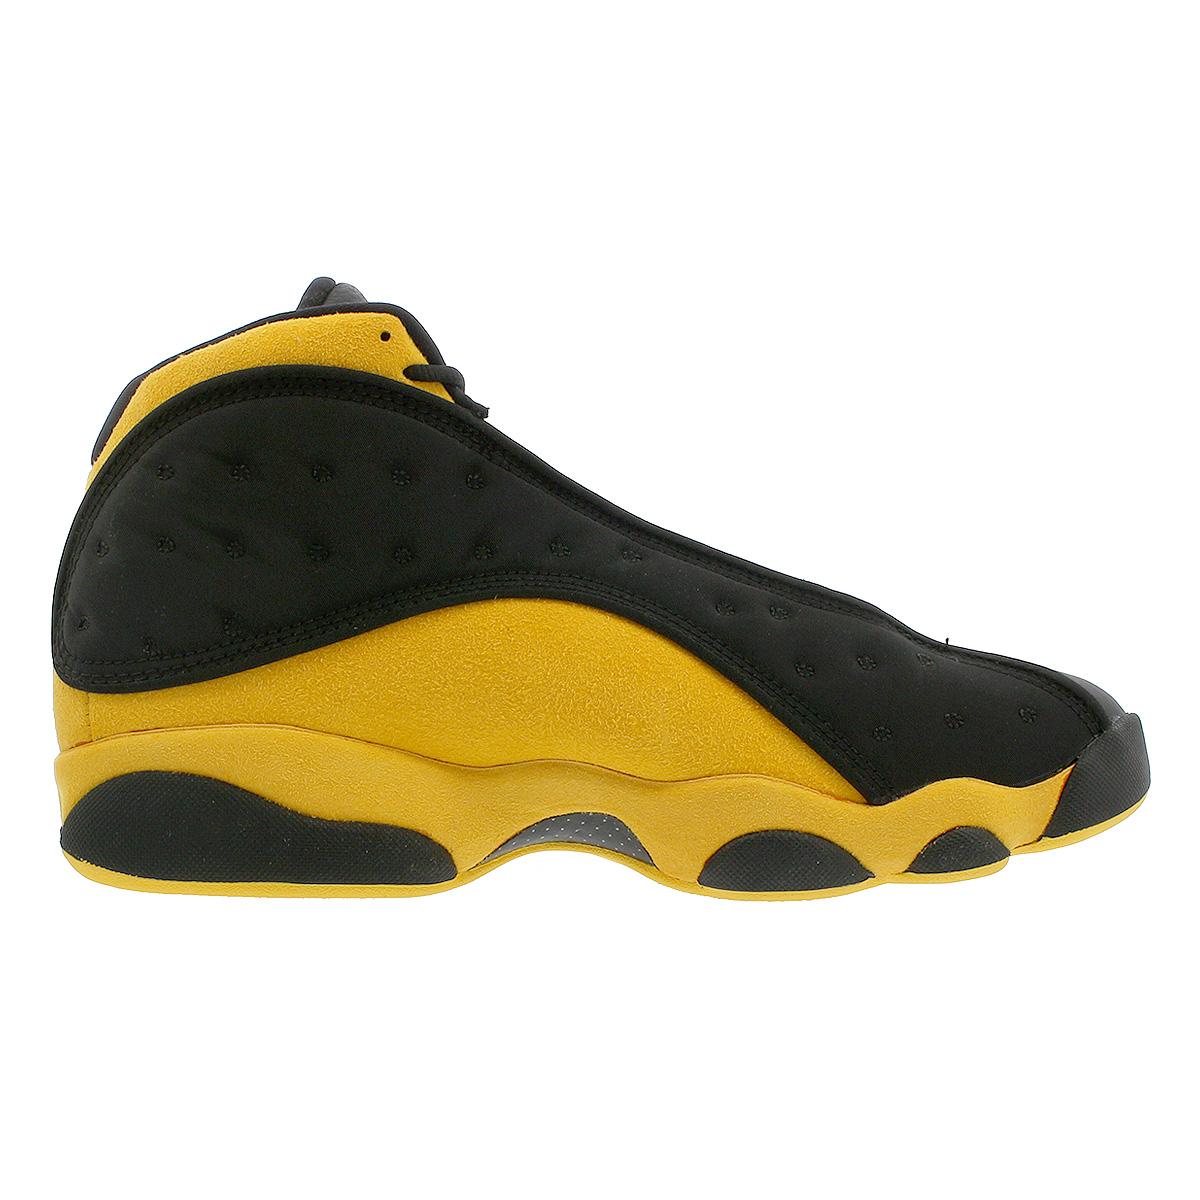 a8fbb59f062d NIKE AIR JORDAN 13 RETRO Nike Air Jordan 13 nostalgic BLACK UNIVERSITY  RED UNIVERSITY GOLD 414